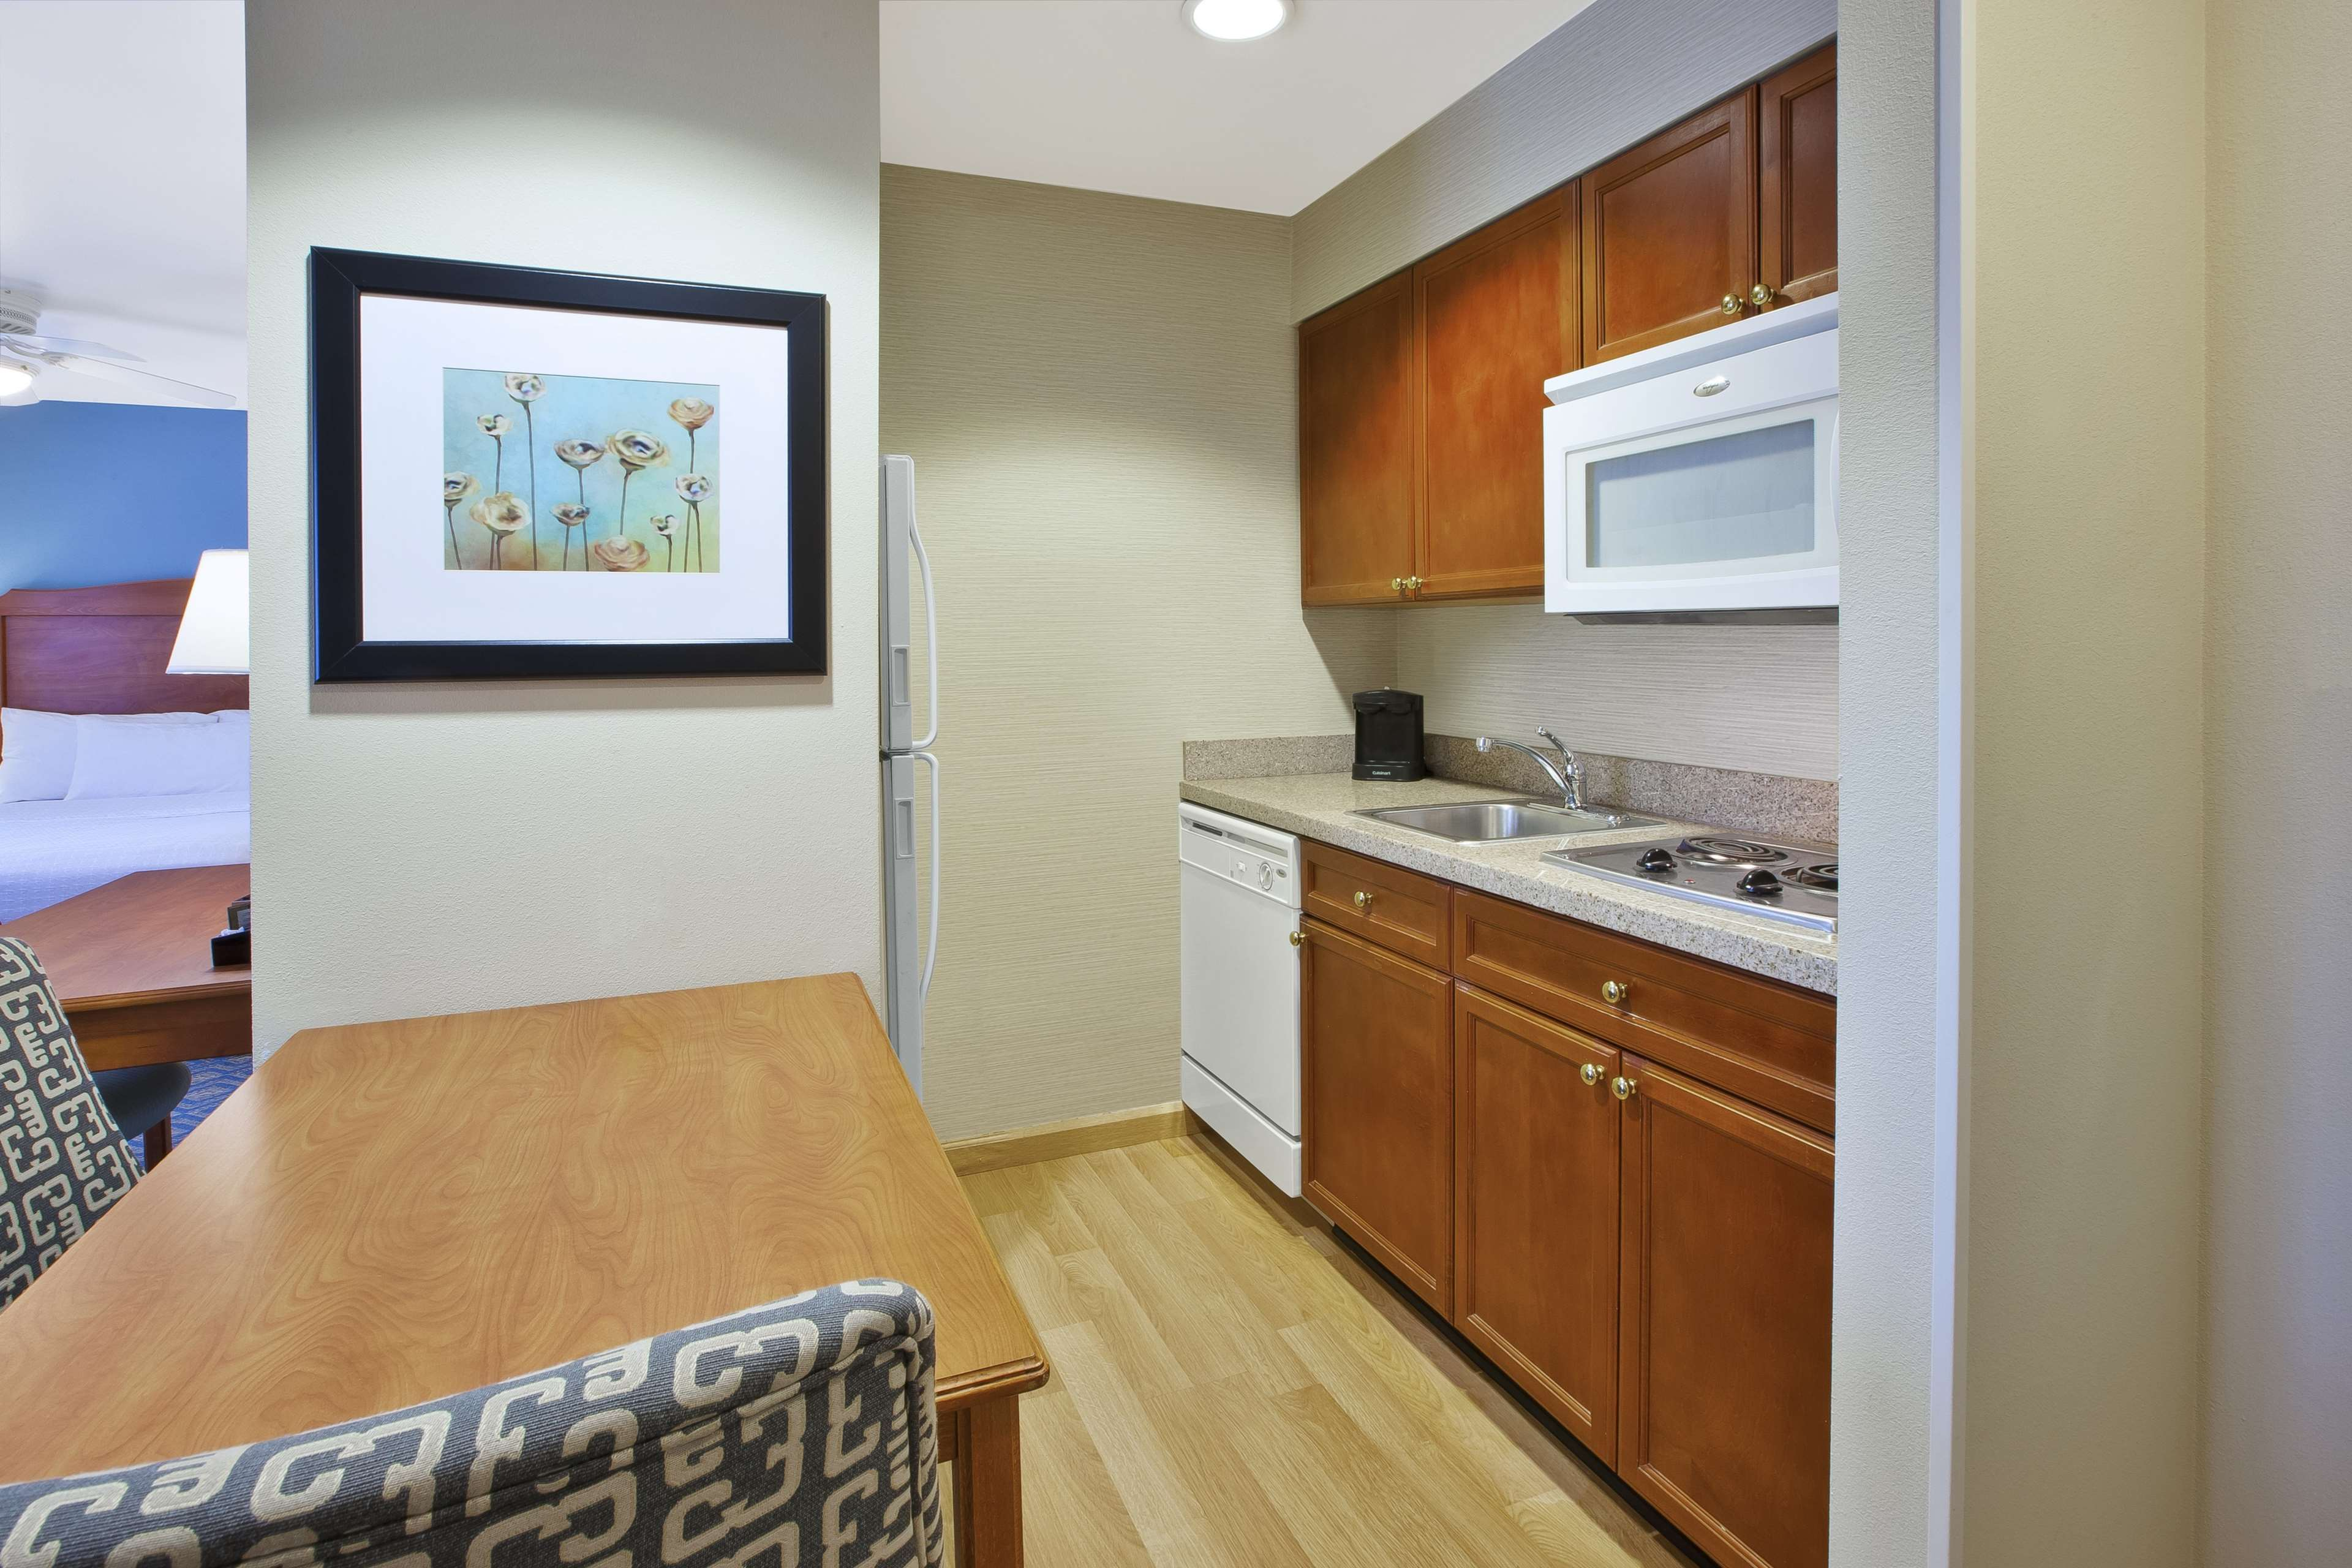 Homewood Suites by Hilton Philadelphia/Mt. Laurel image 14